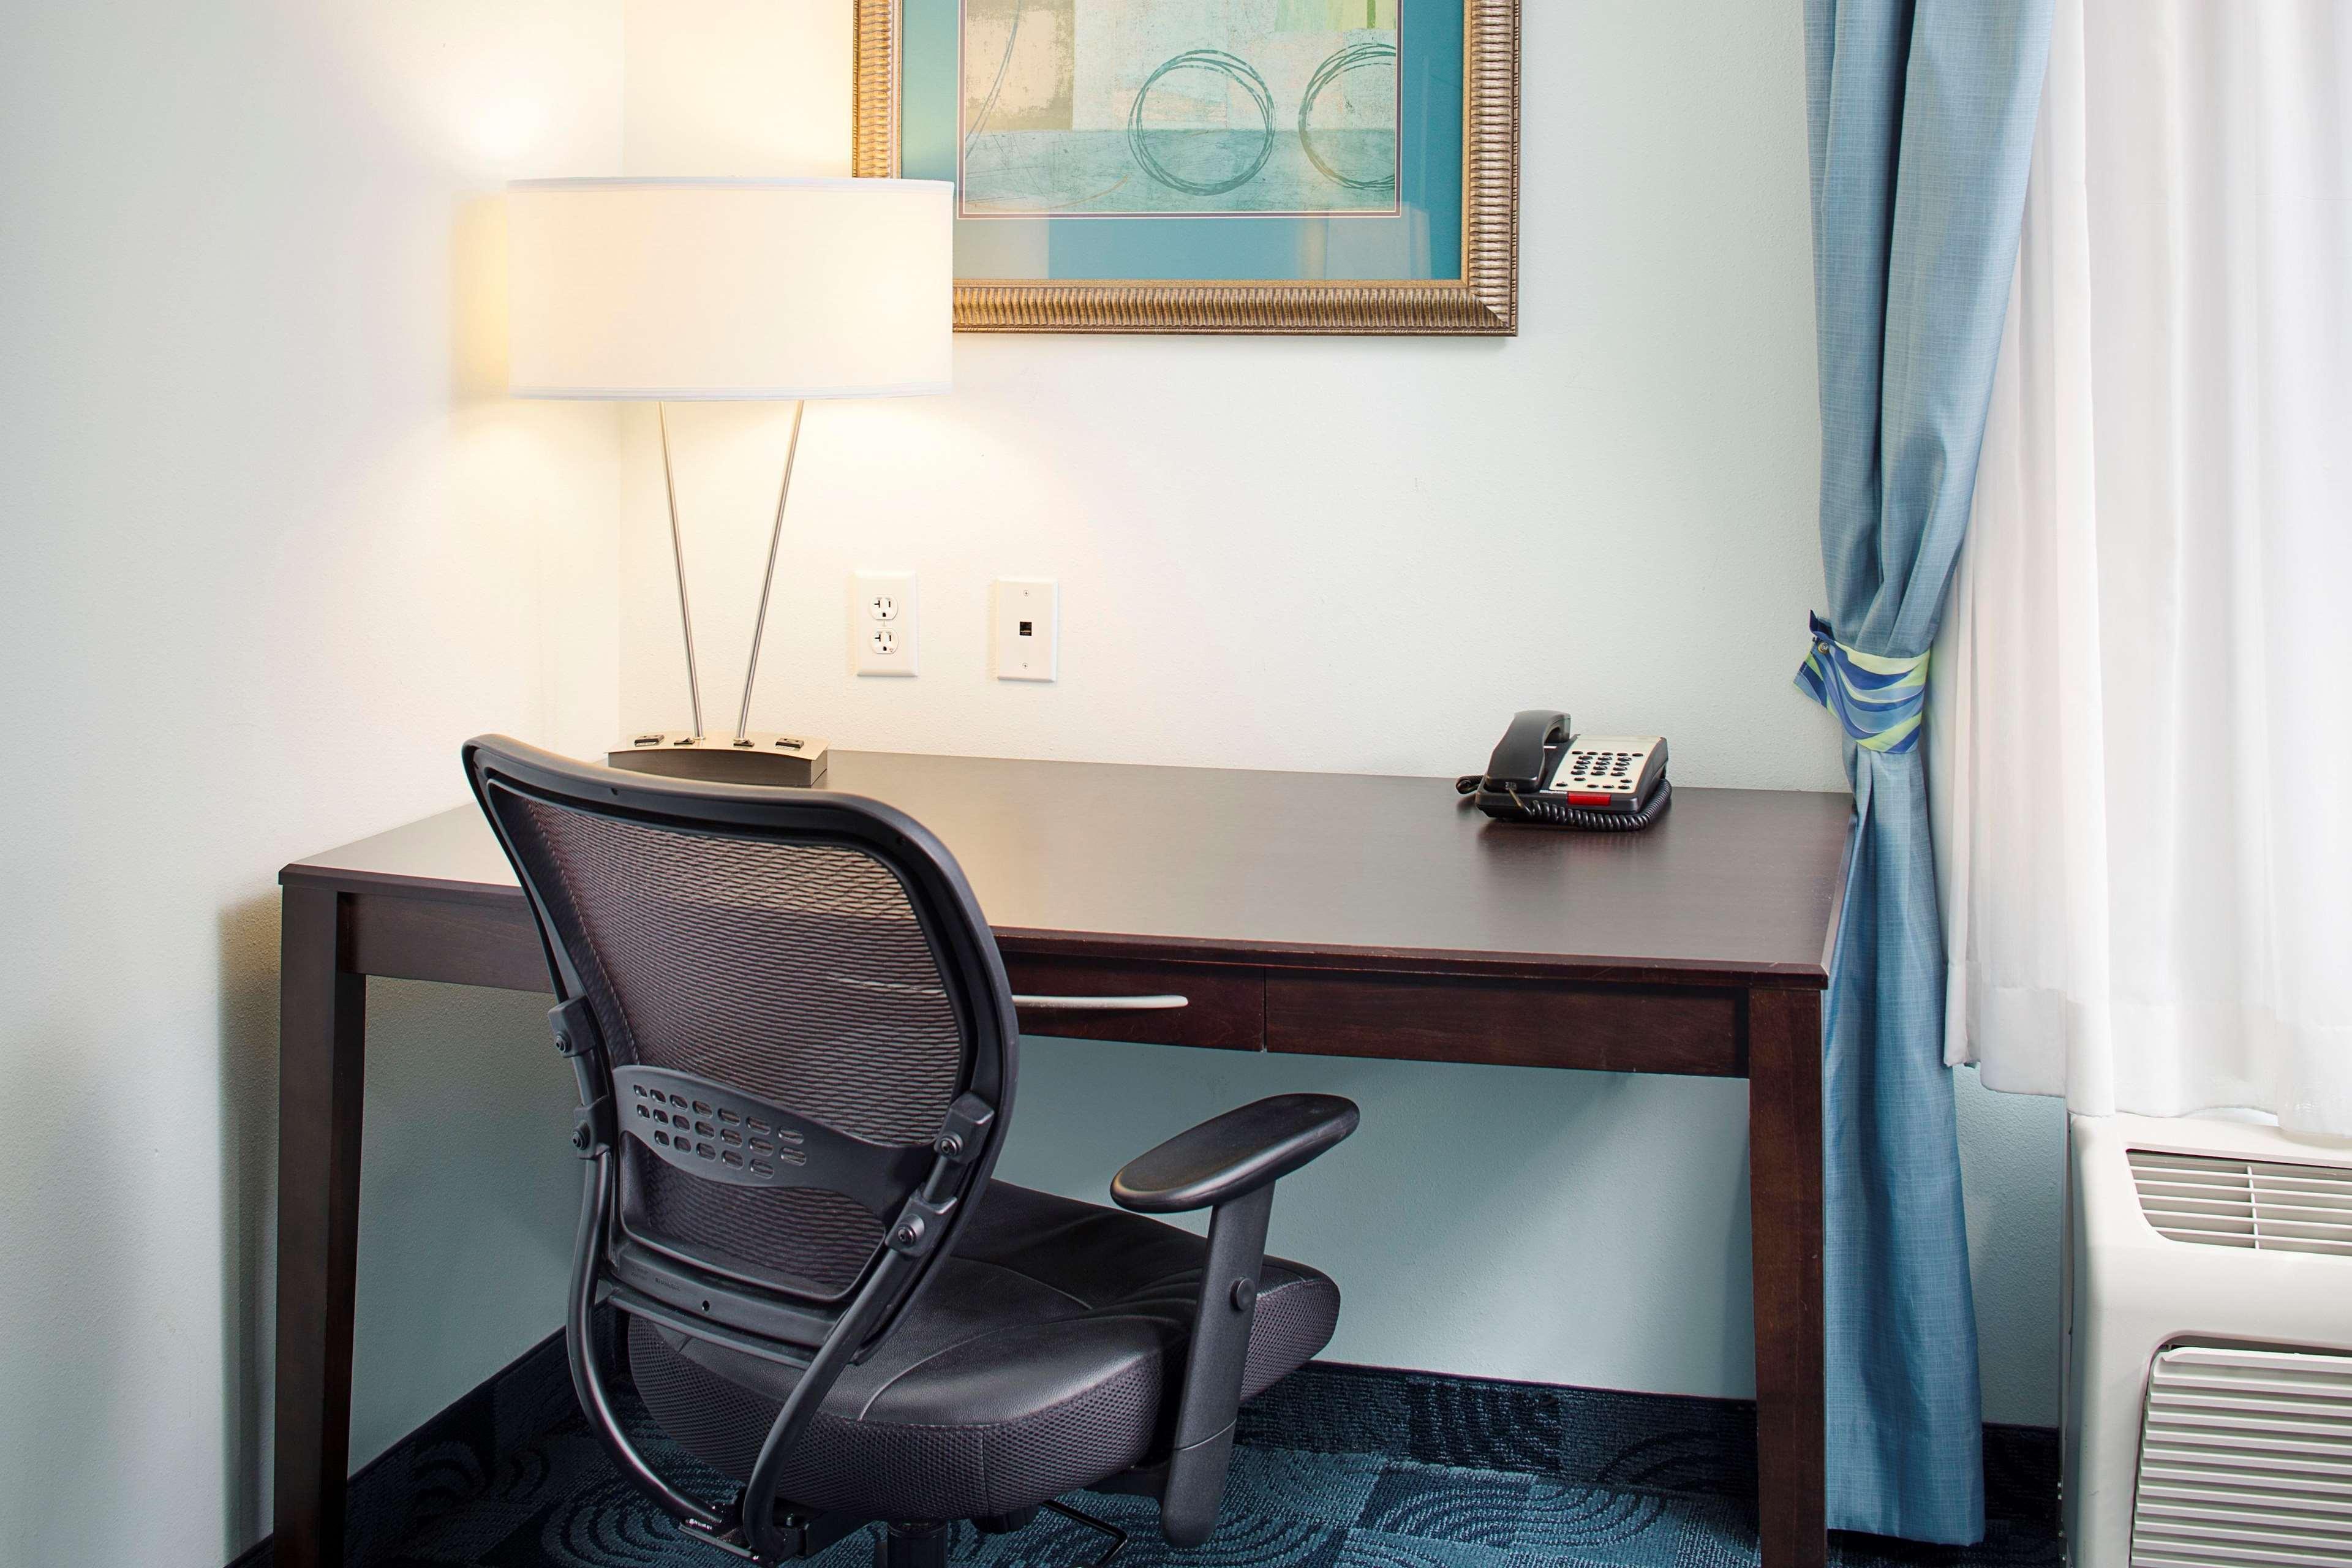 Hampton Inn & Suites Dallas/Lewisville-Vista Ridge Mall, TX image 41